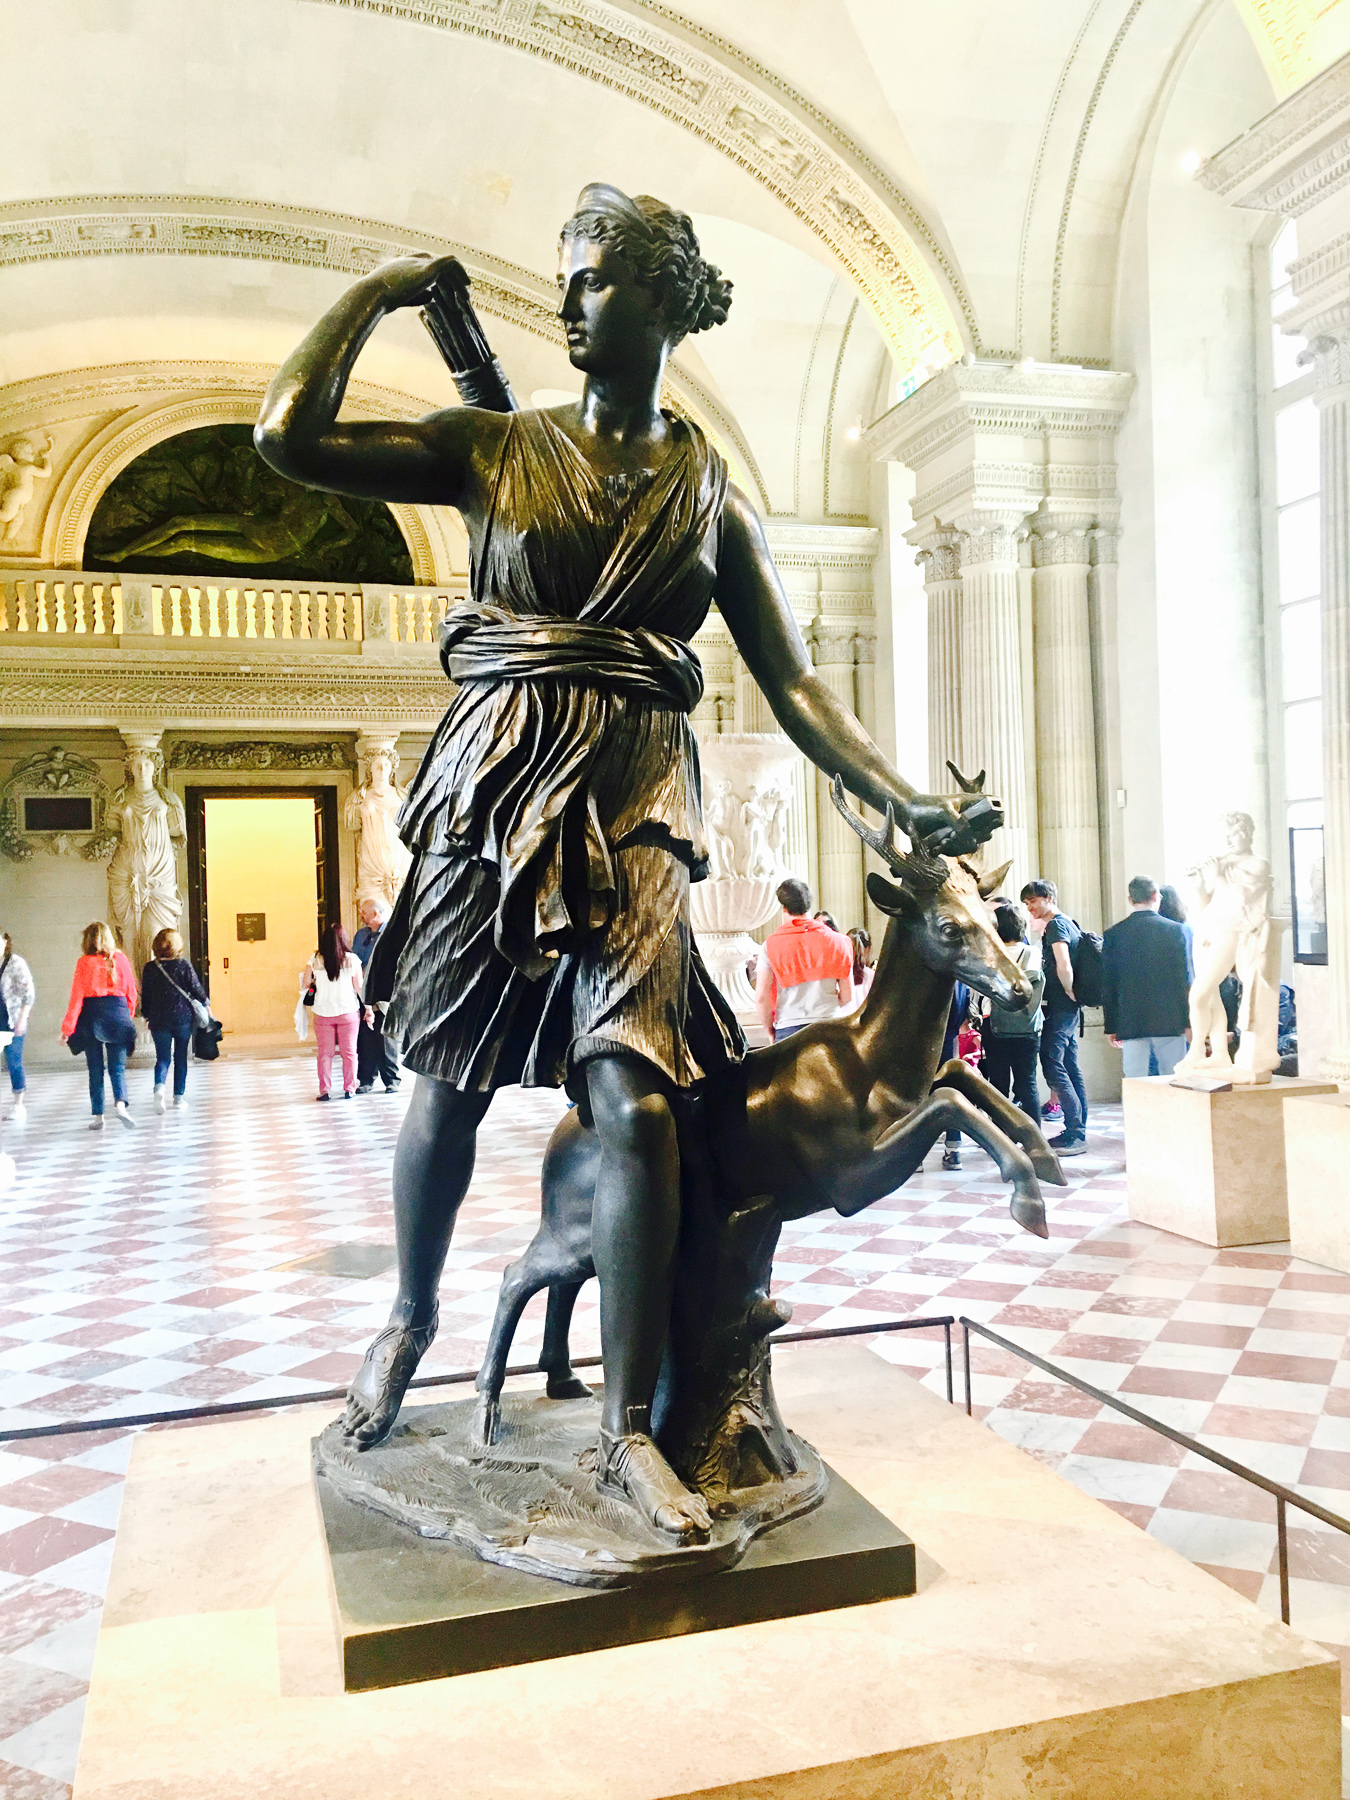 Artemis and deer spirit at the Louvre